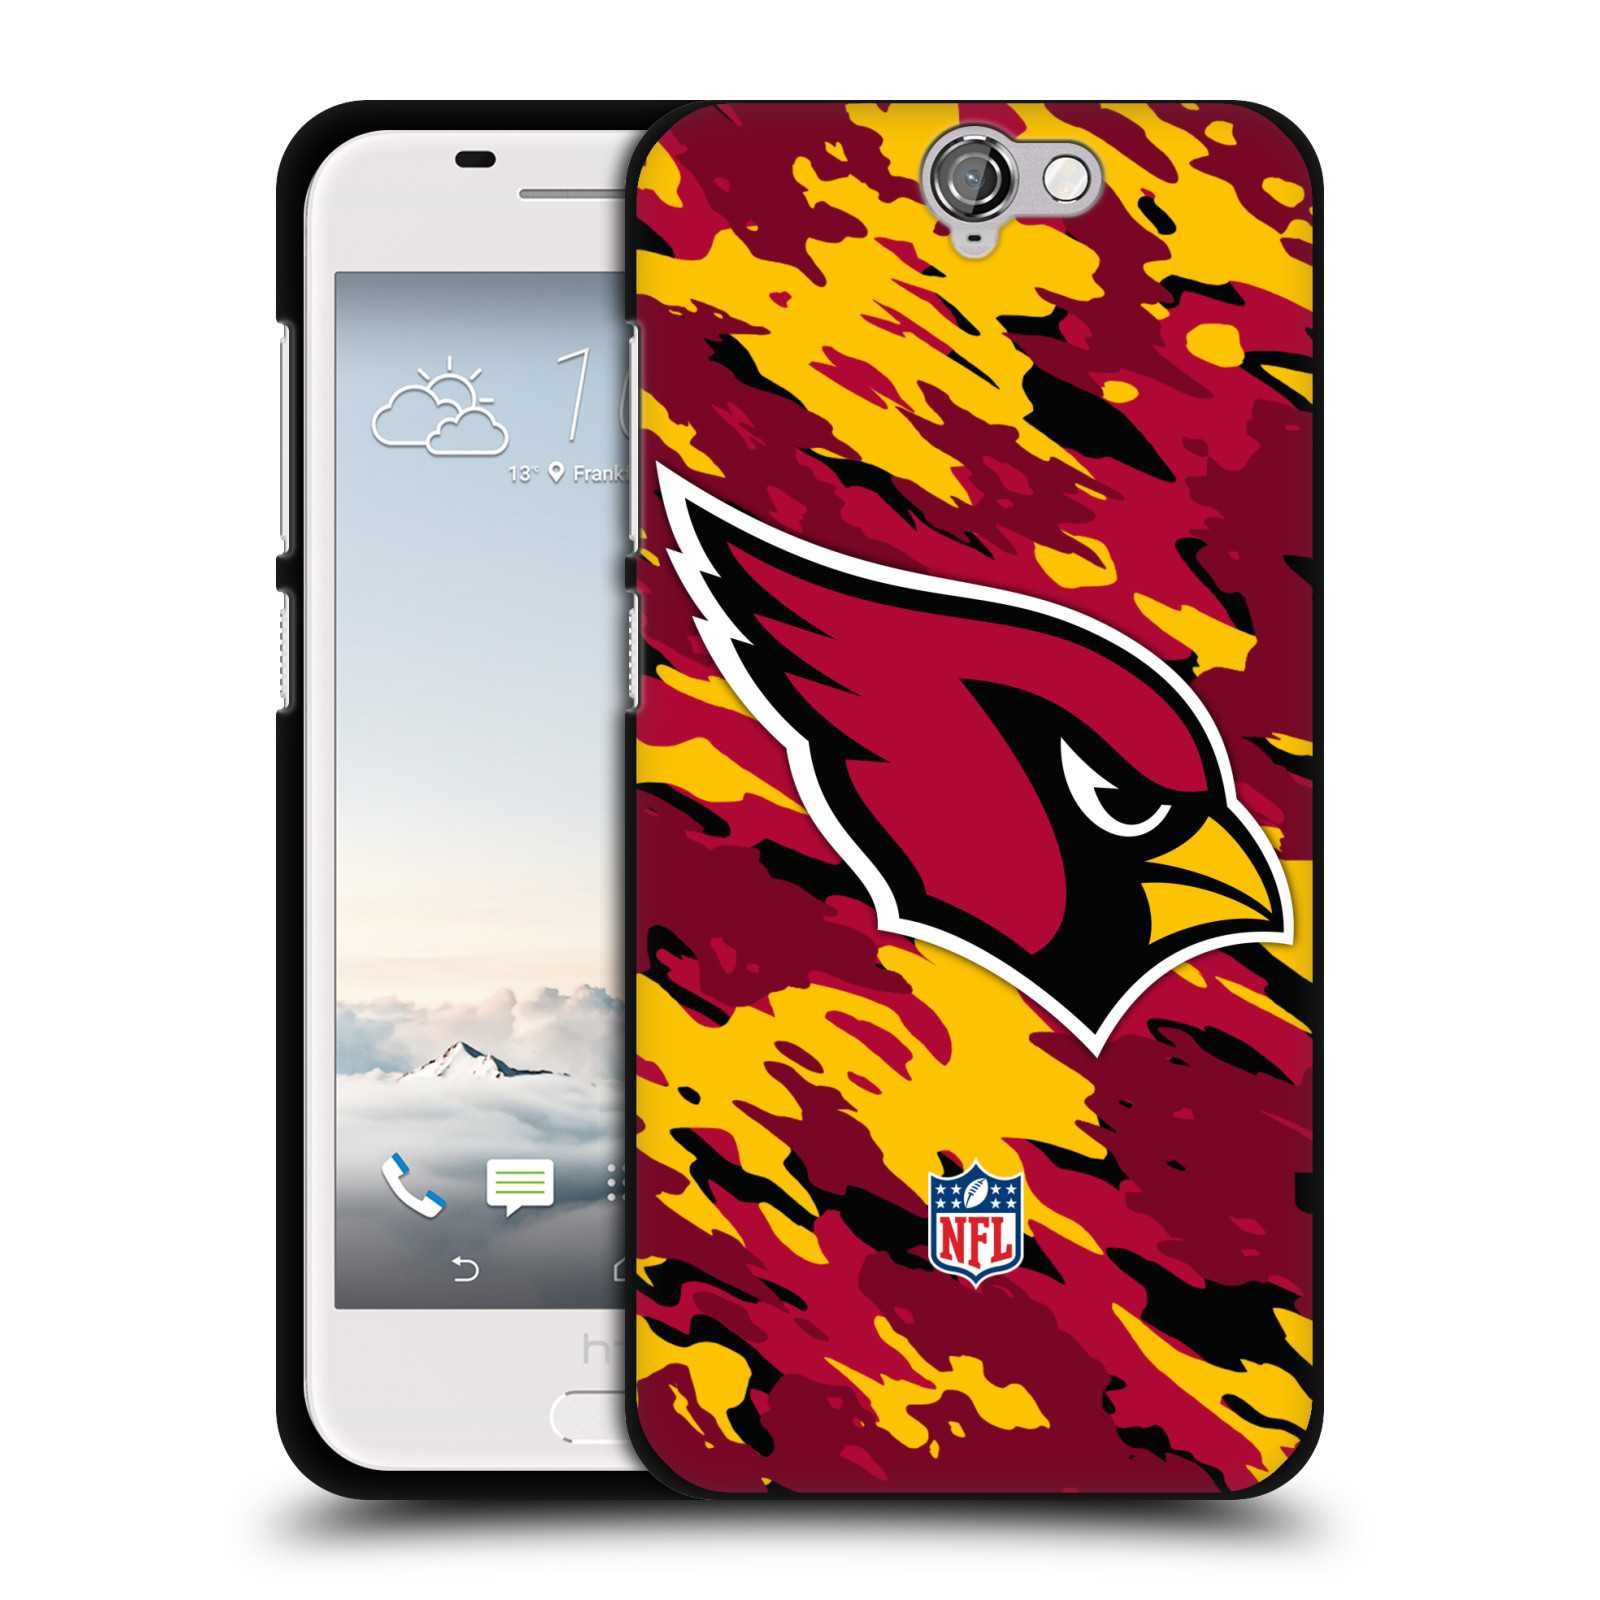 OFFICIAL-NFL-ARIZONA-CARDINALS-LOGO-BLACK-SOFT-GEL-CASE-FOR-HTC-PHONES